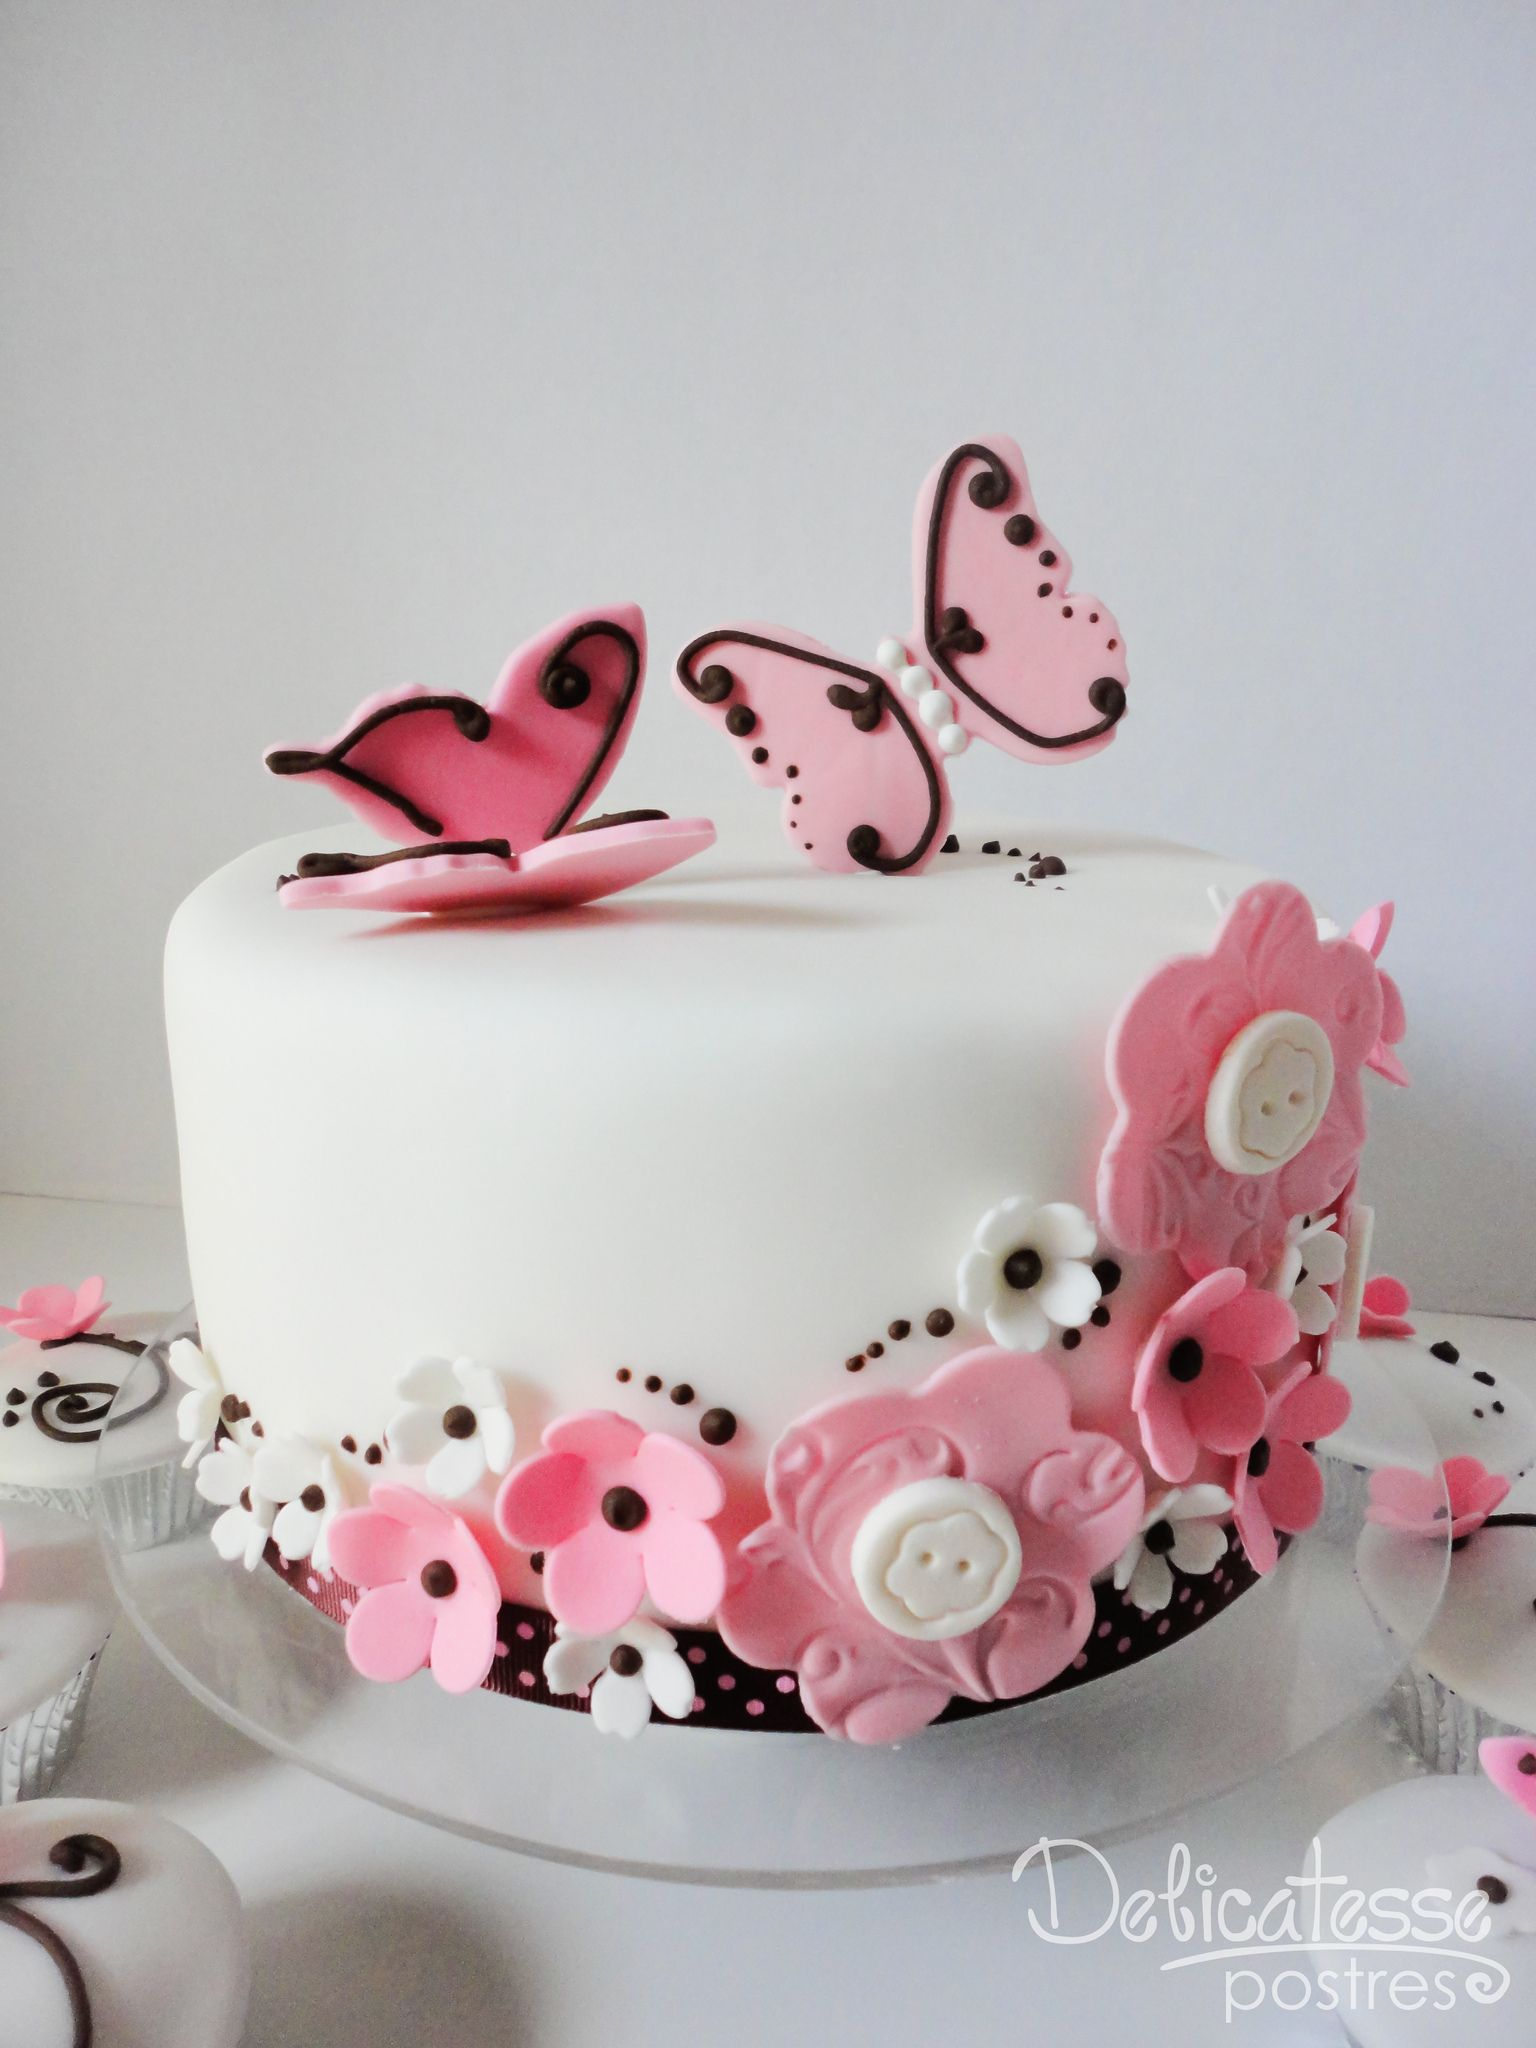 https://flic.kr/p/bwfZeh | Flowers & Butterflies Choco Pink Cake